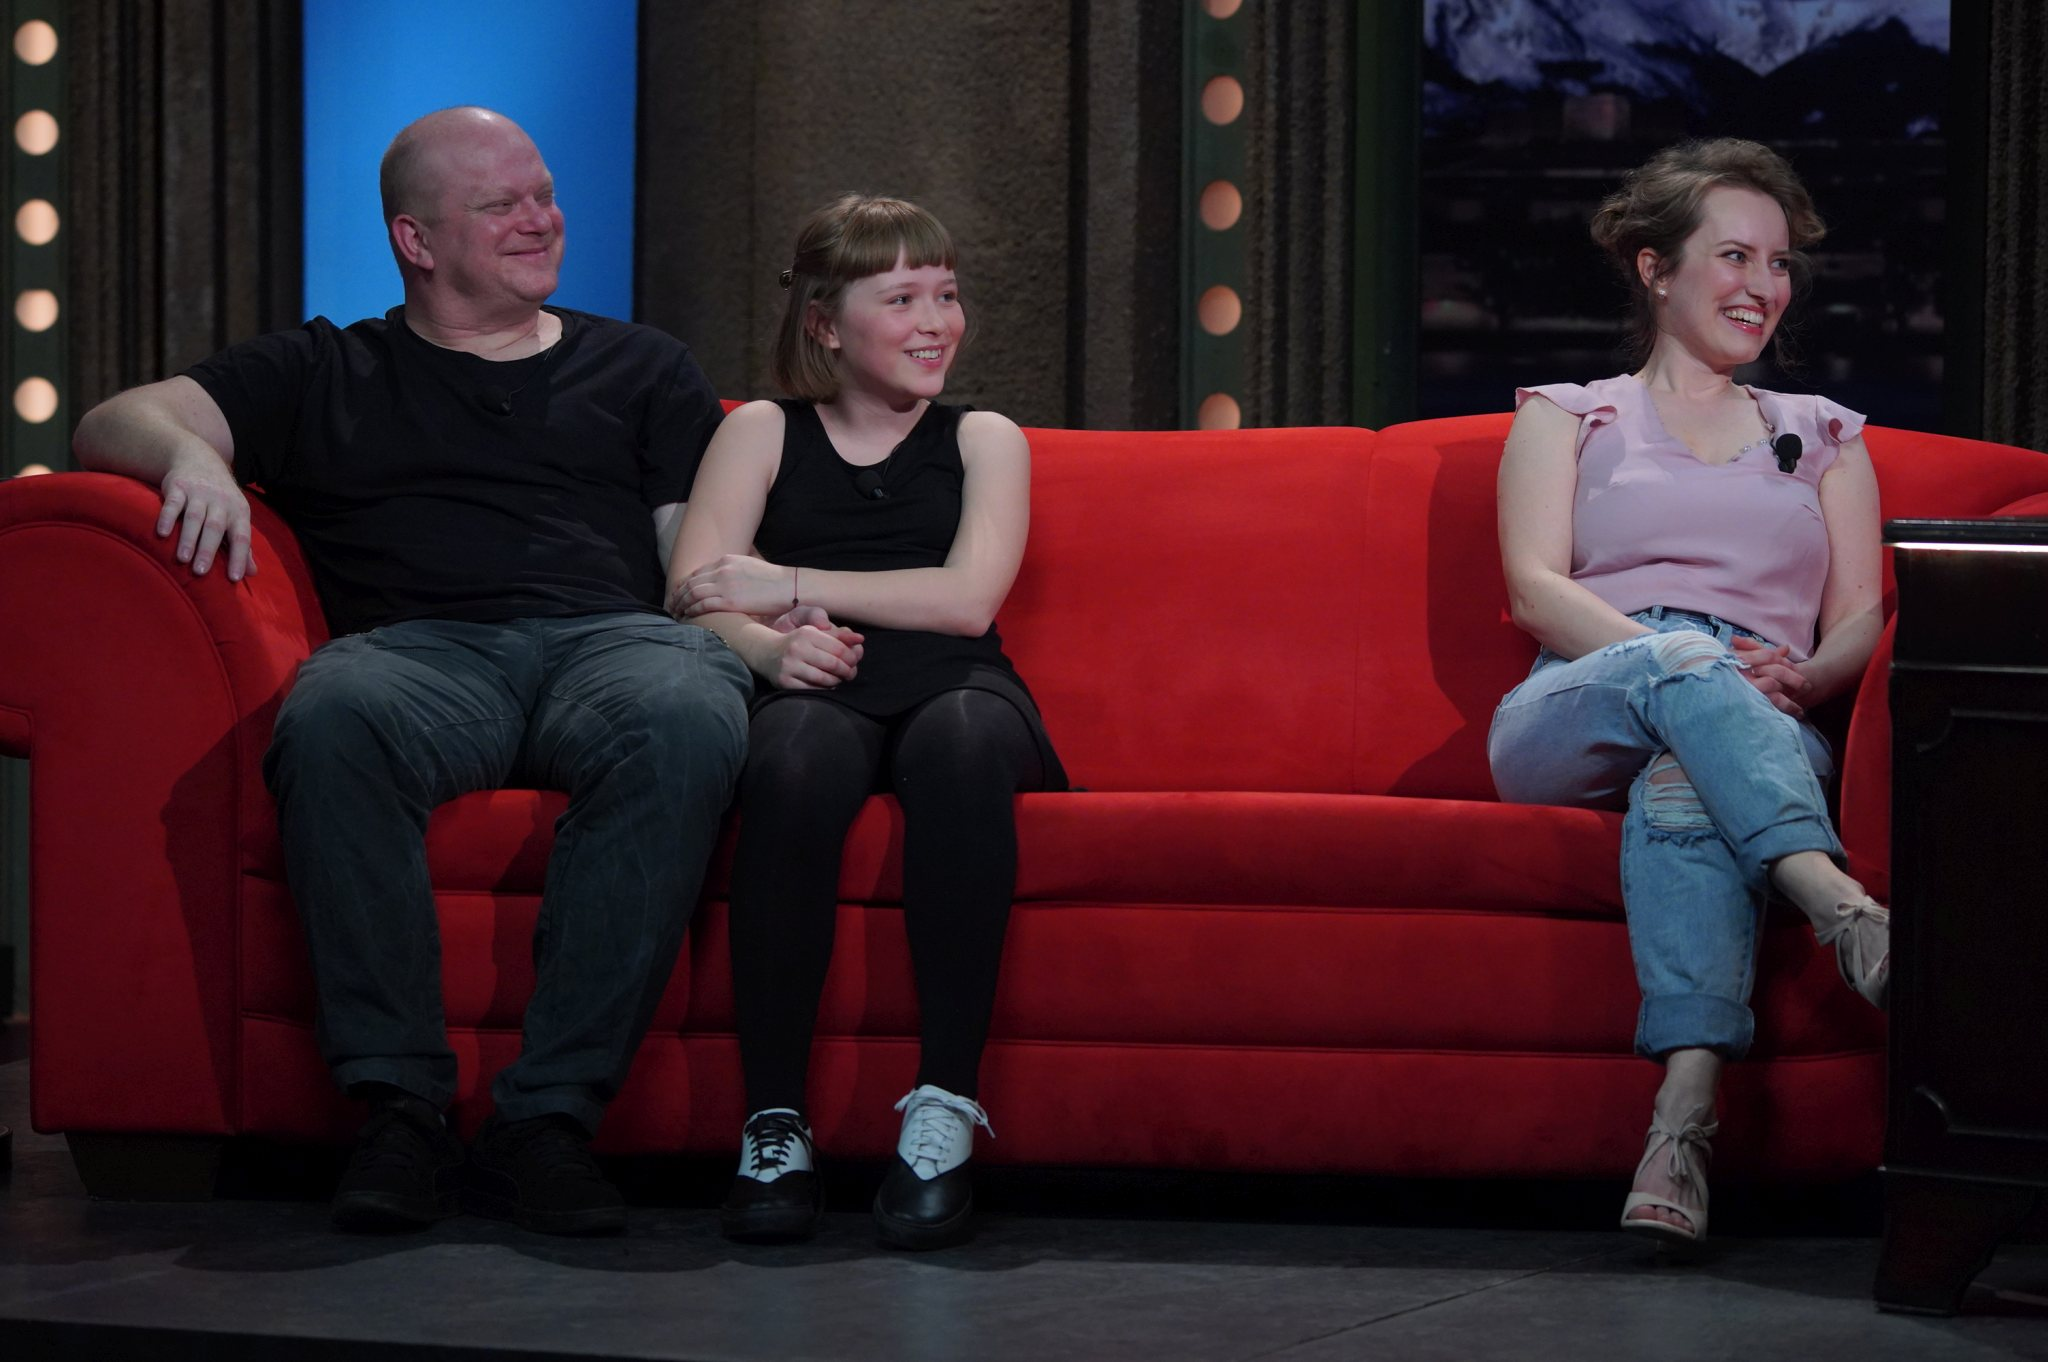 Zleva: Herec David Novotný s dcerou Anežkou a marketingová specialistka a kuchařka Pavlína Lubojatzky v SJK 17. 3. 2021